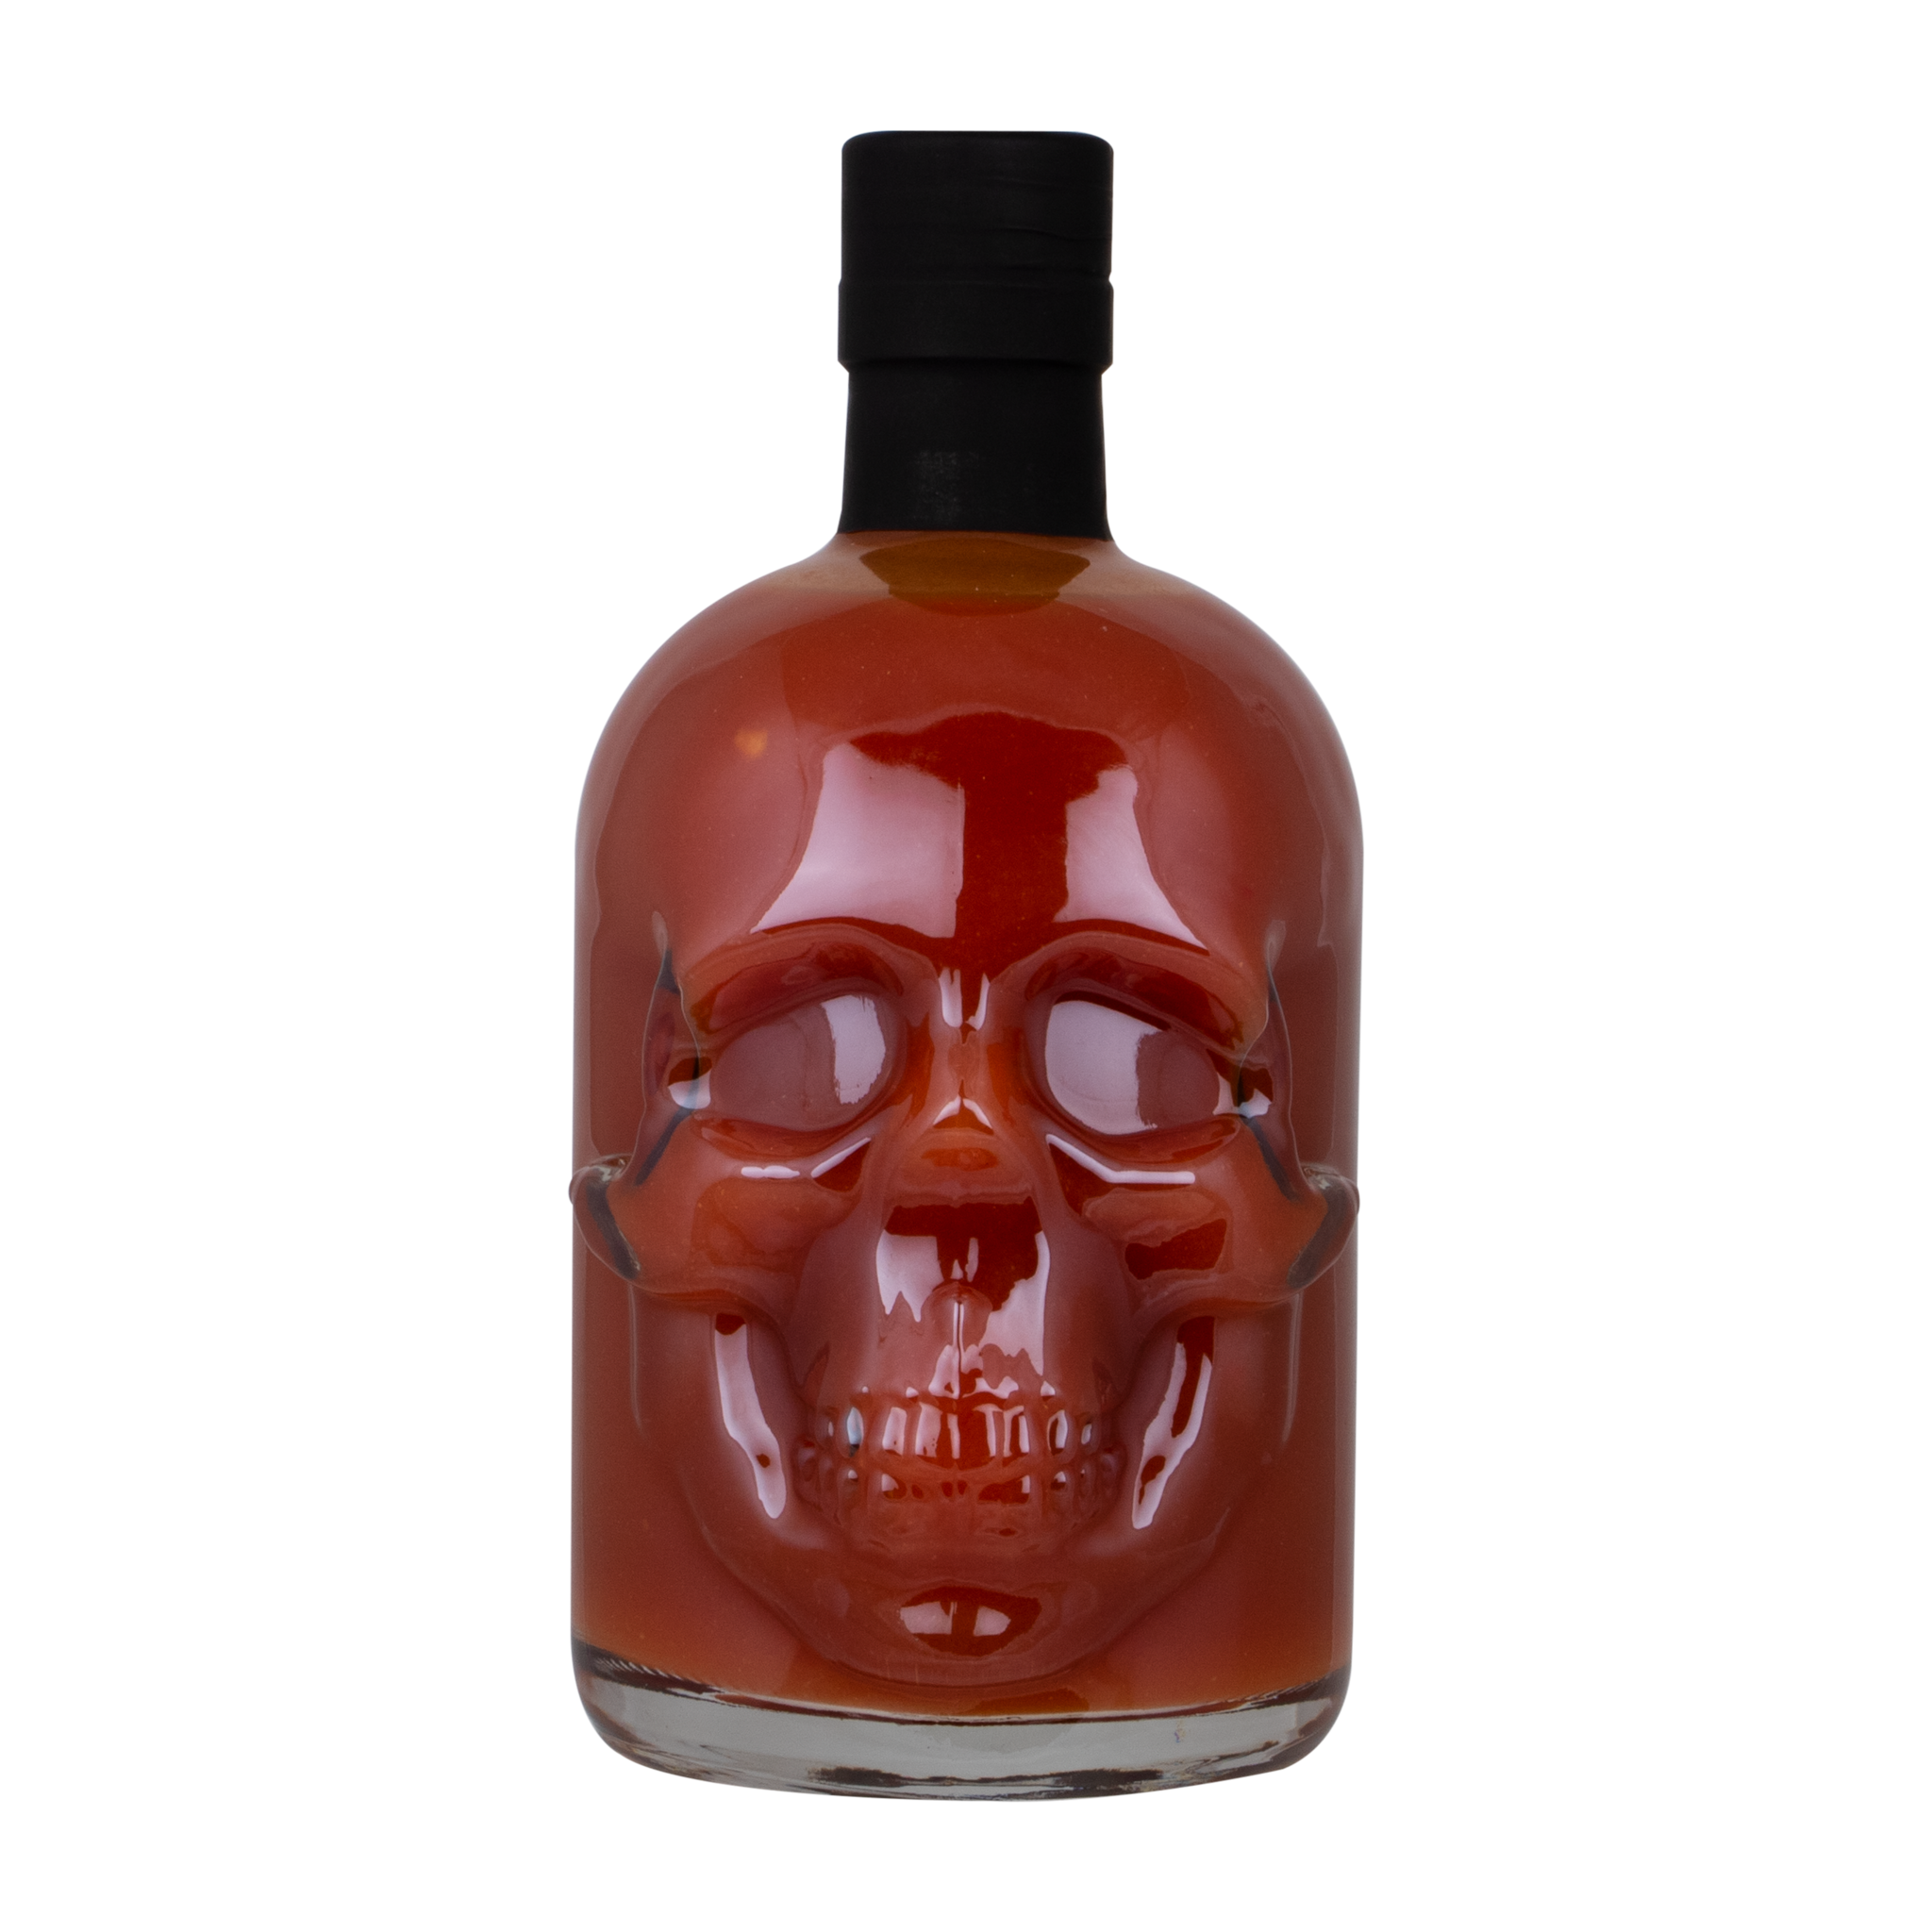 Saus.Guru's Skull Hot Sauce Deathwish-1